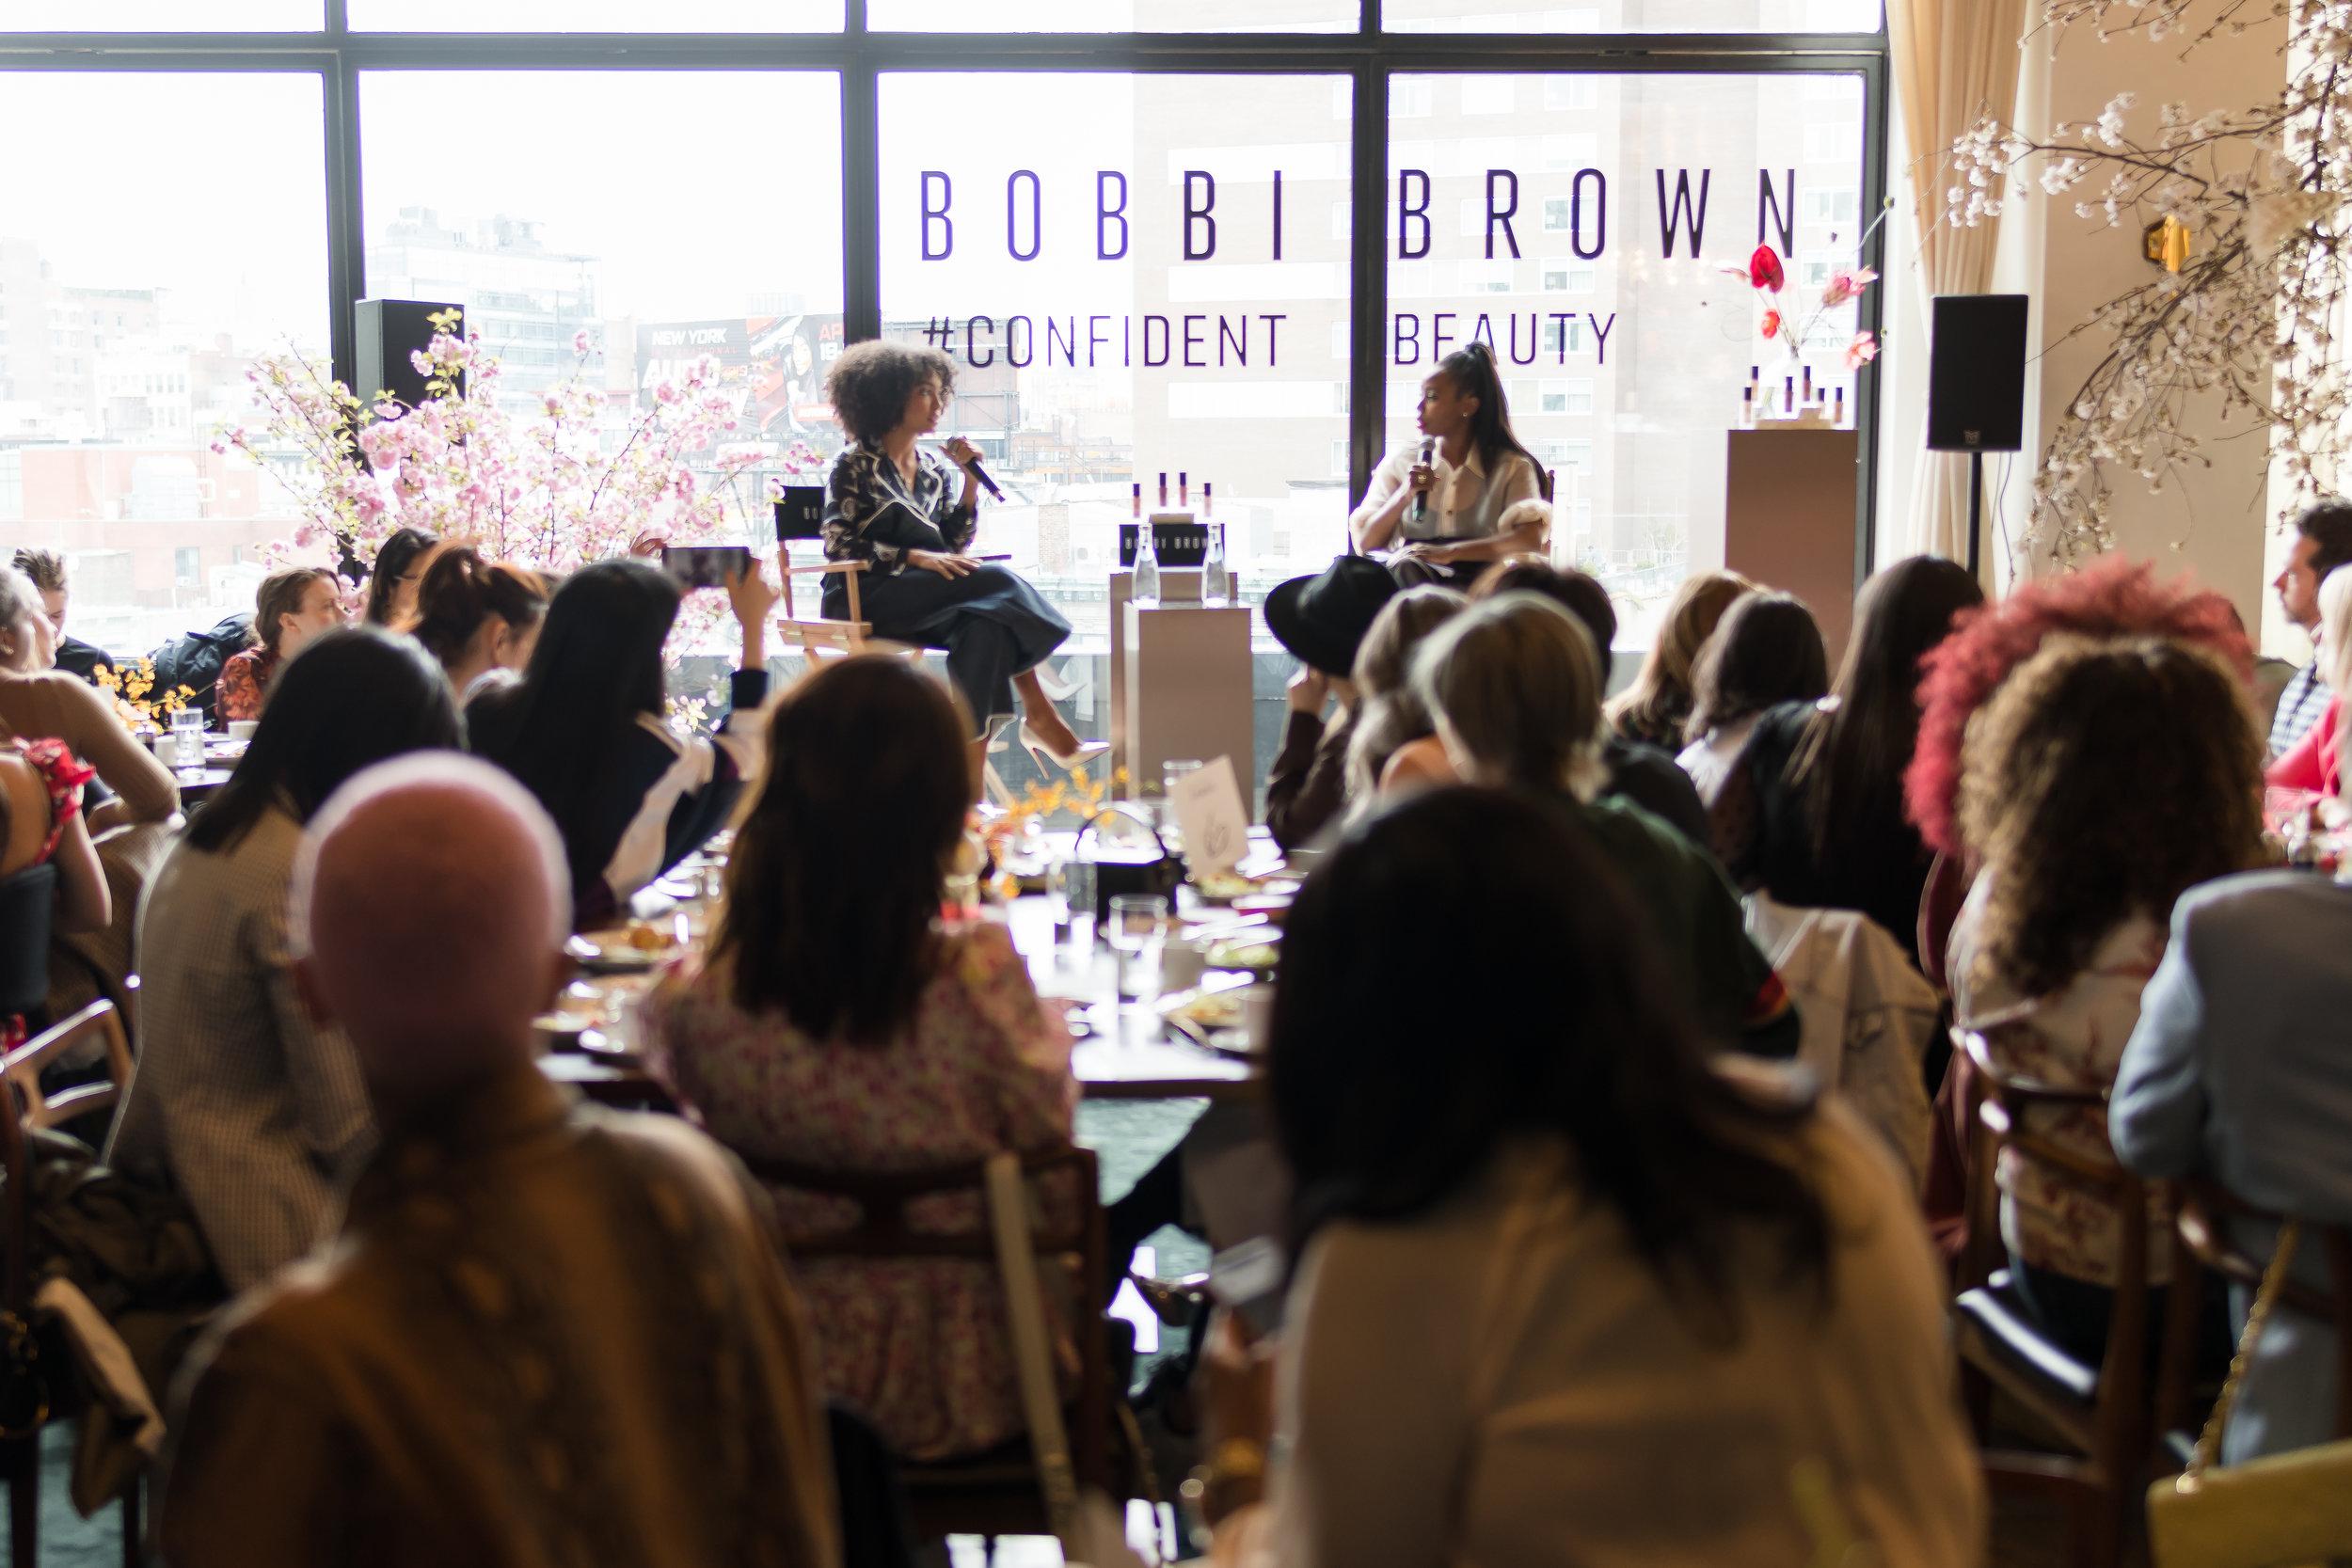 Bobbi Brown Confident Beauty by @martsromero 005 DSC_3455 20190412.jpg